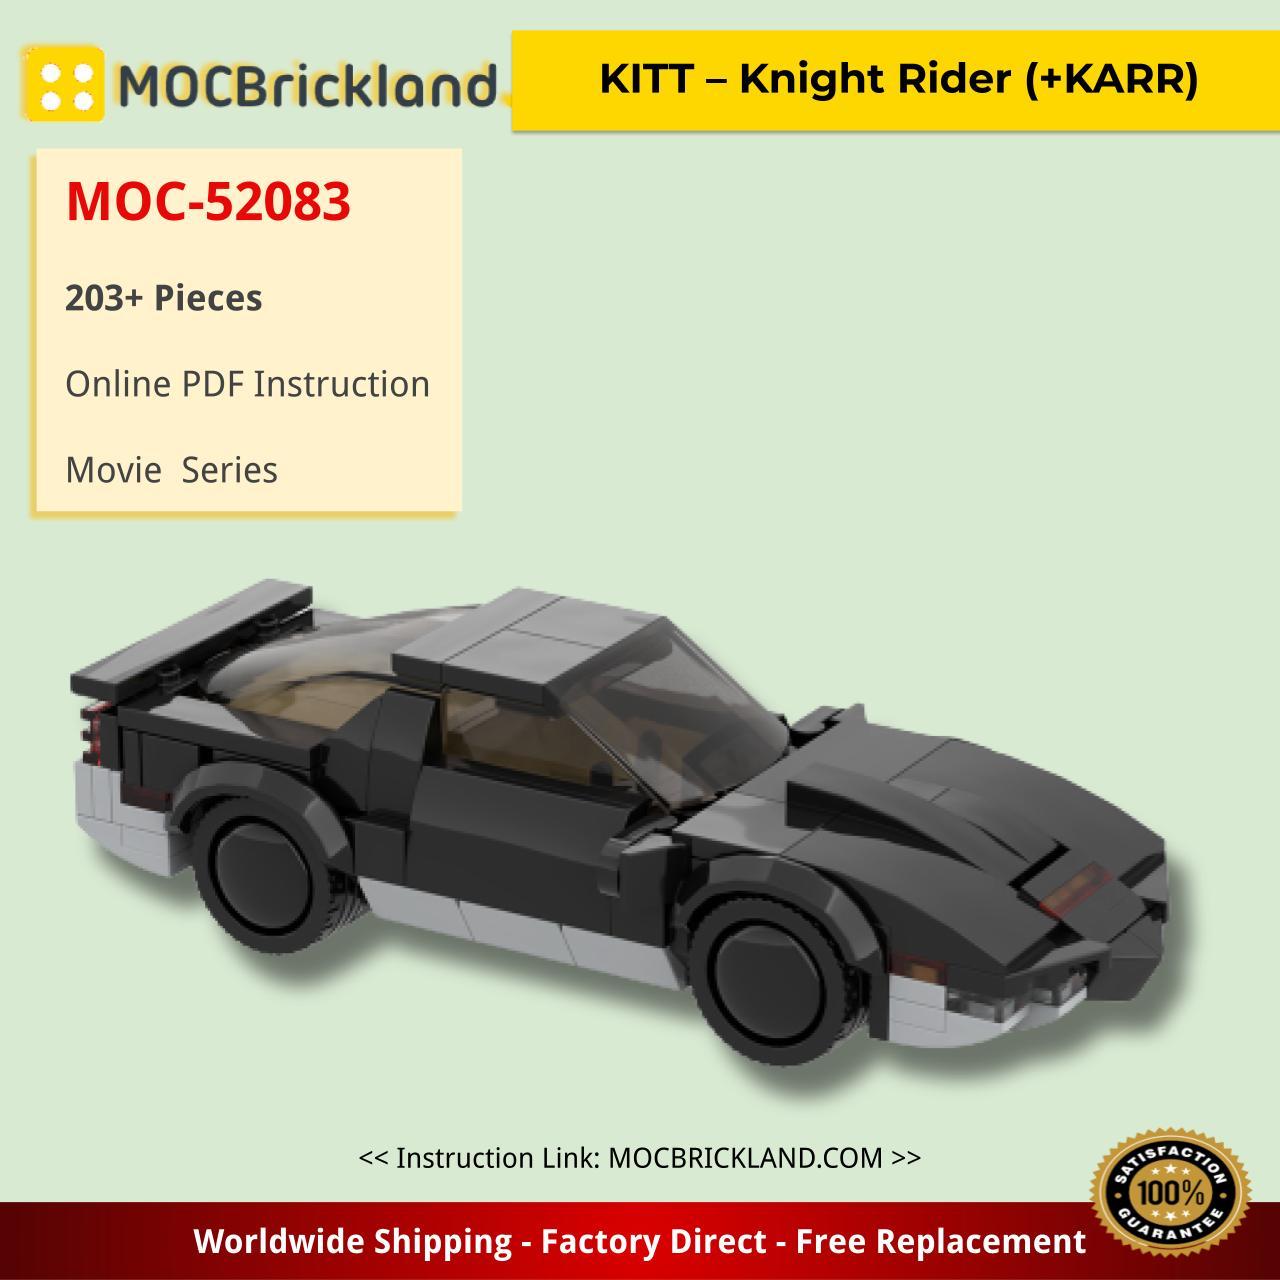 KITT – Knight Rider (+KARR) Movie MOC-52083 by _TLG_ WITH 203 PIECES